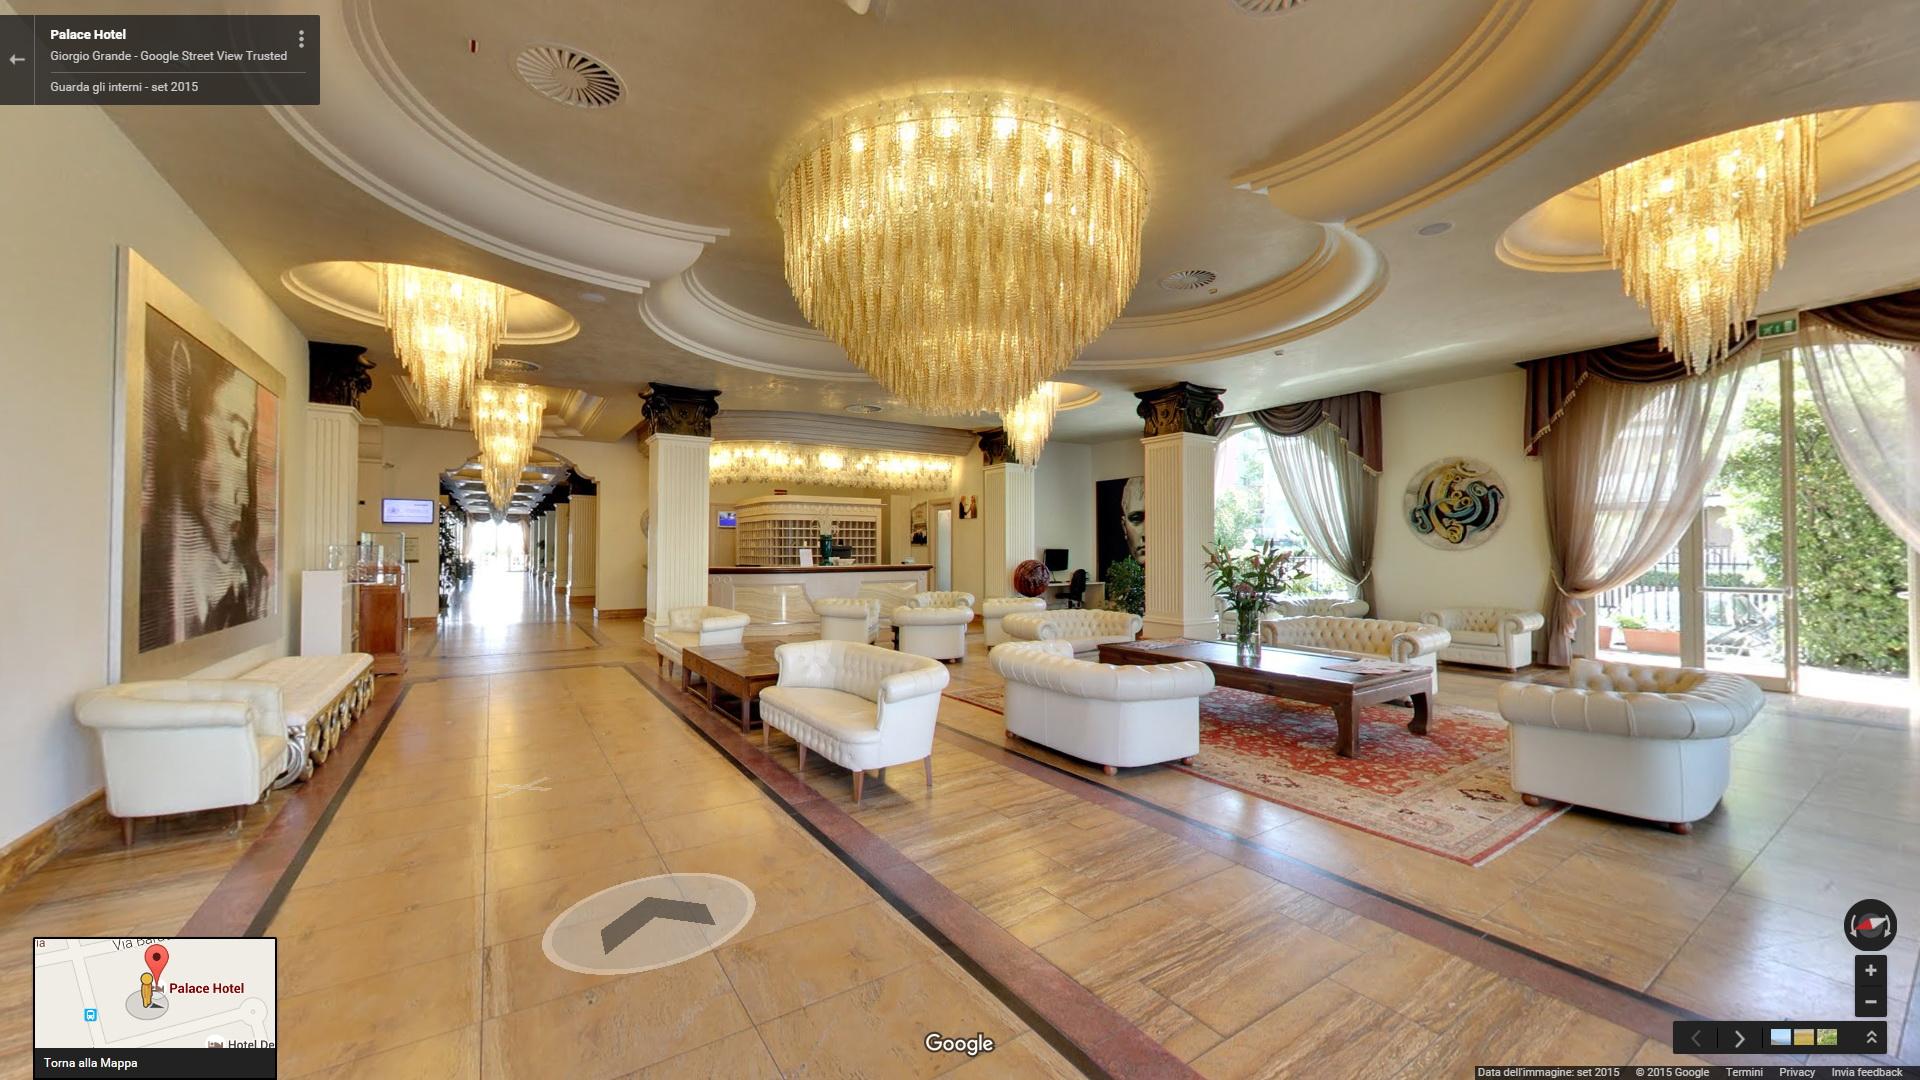 Hotel palace milano marittima clickinside - Hotel con piscina coperta milano marittima ...